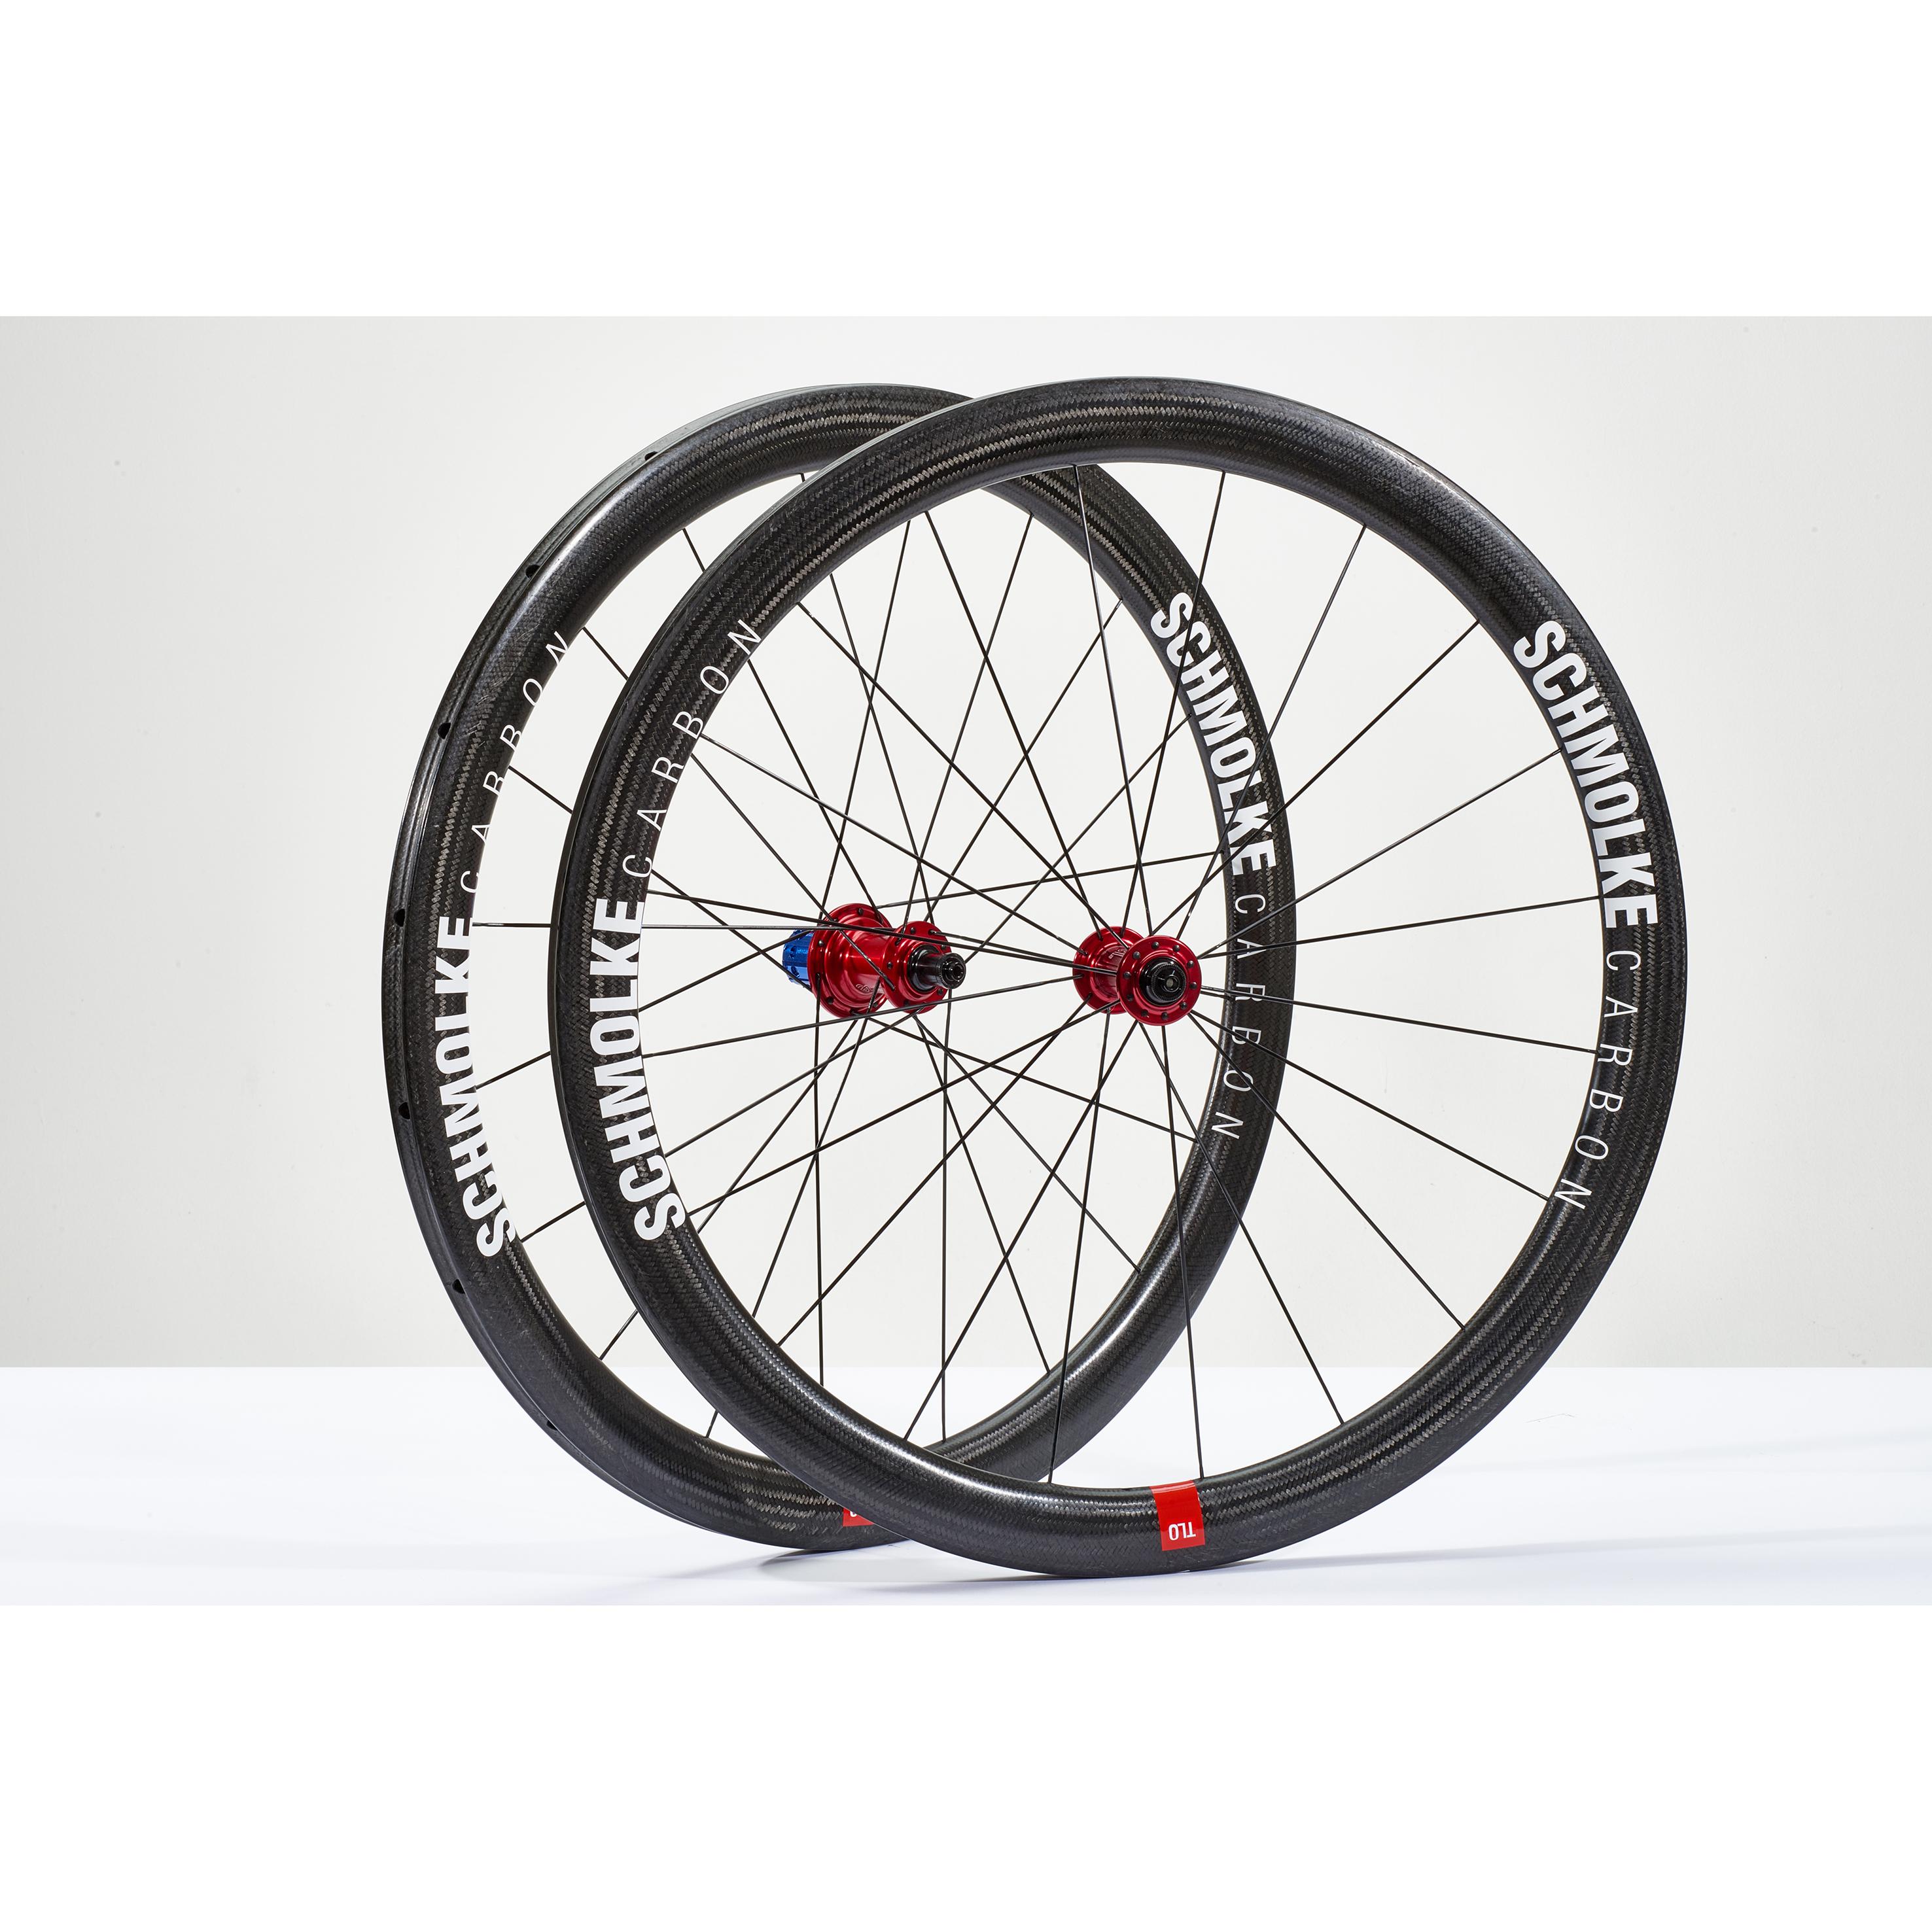 SL 45 Tubular Wheelset